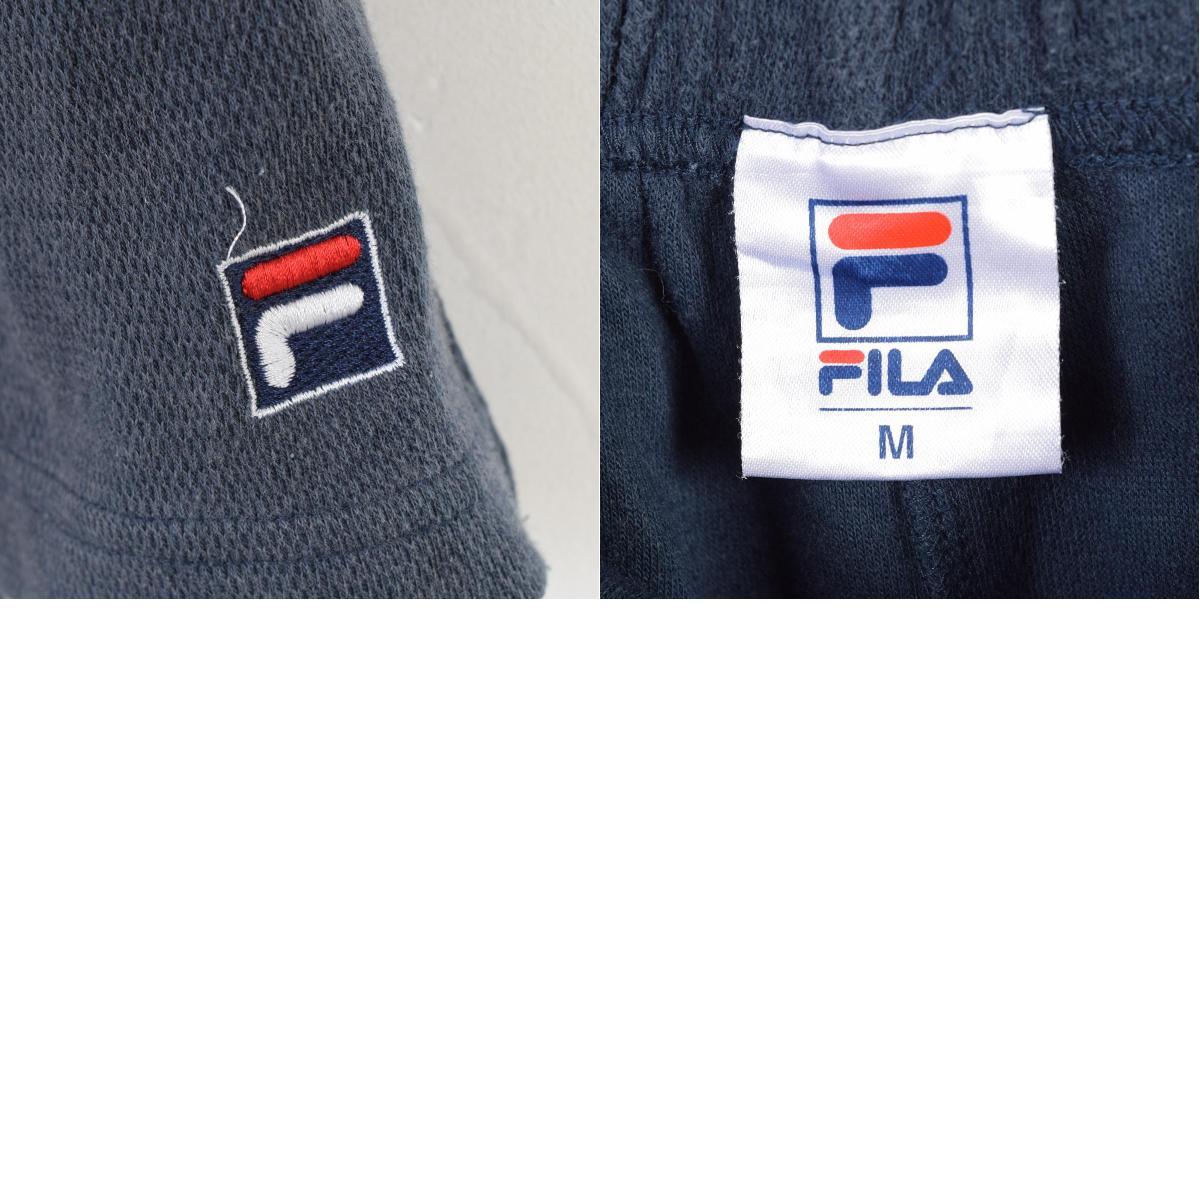 Fira swettshorts 短裤男装 M FILA /wet1260 160707